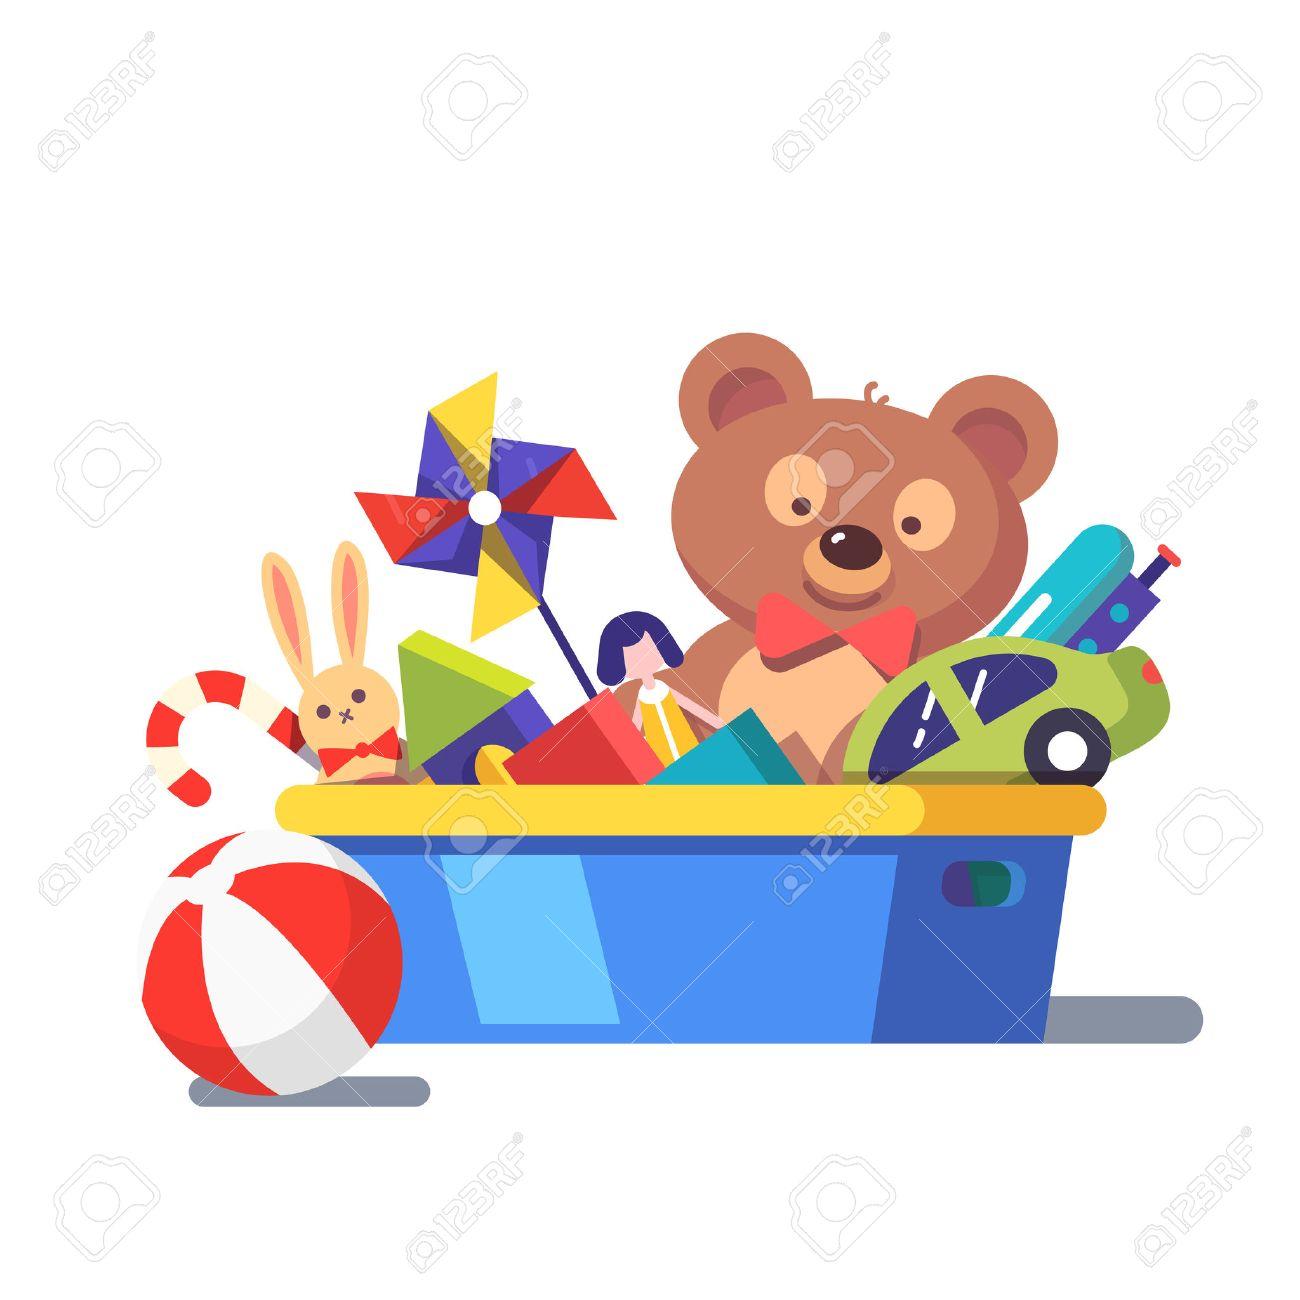 kids toy box full of toys modern flat style vector illustration rh 123rf com clipart toys free clip art toy box